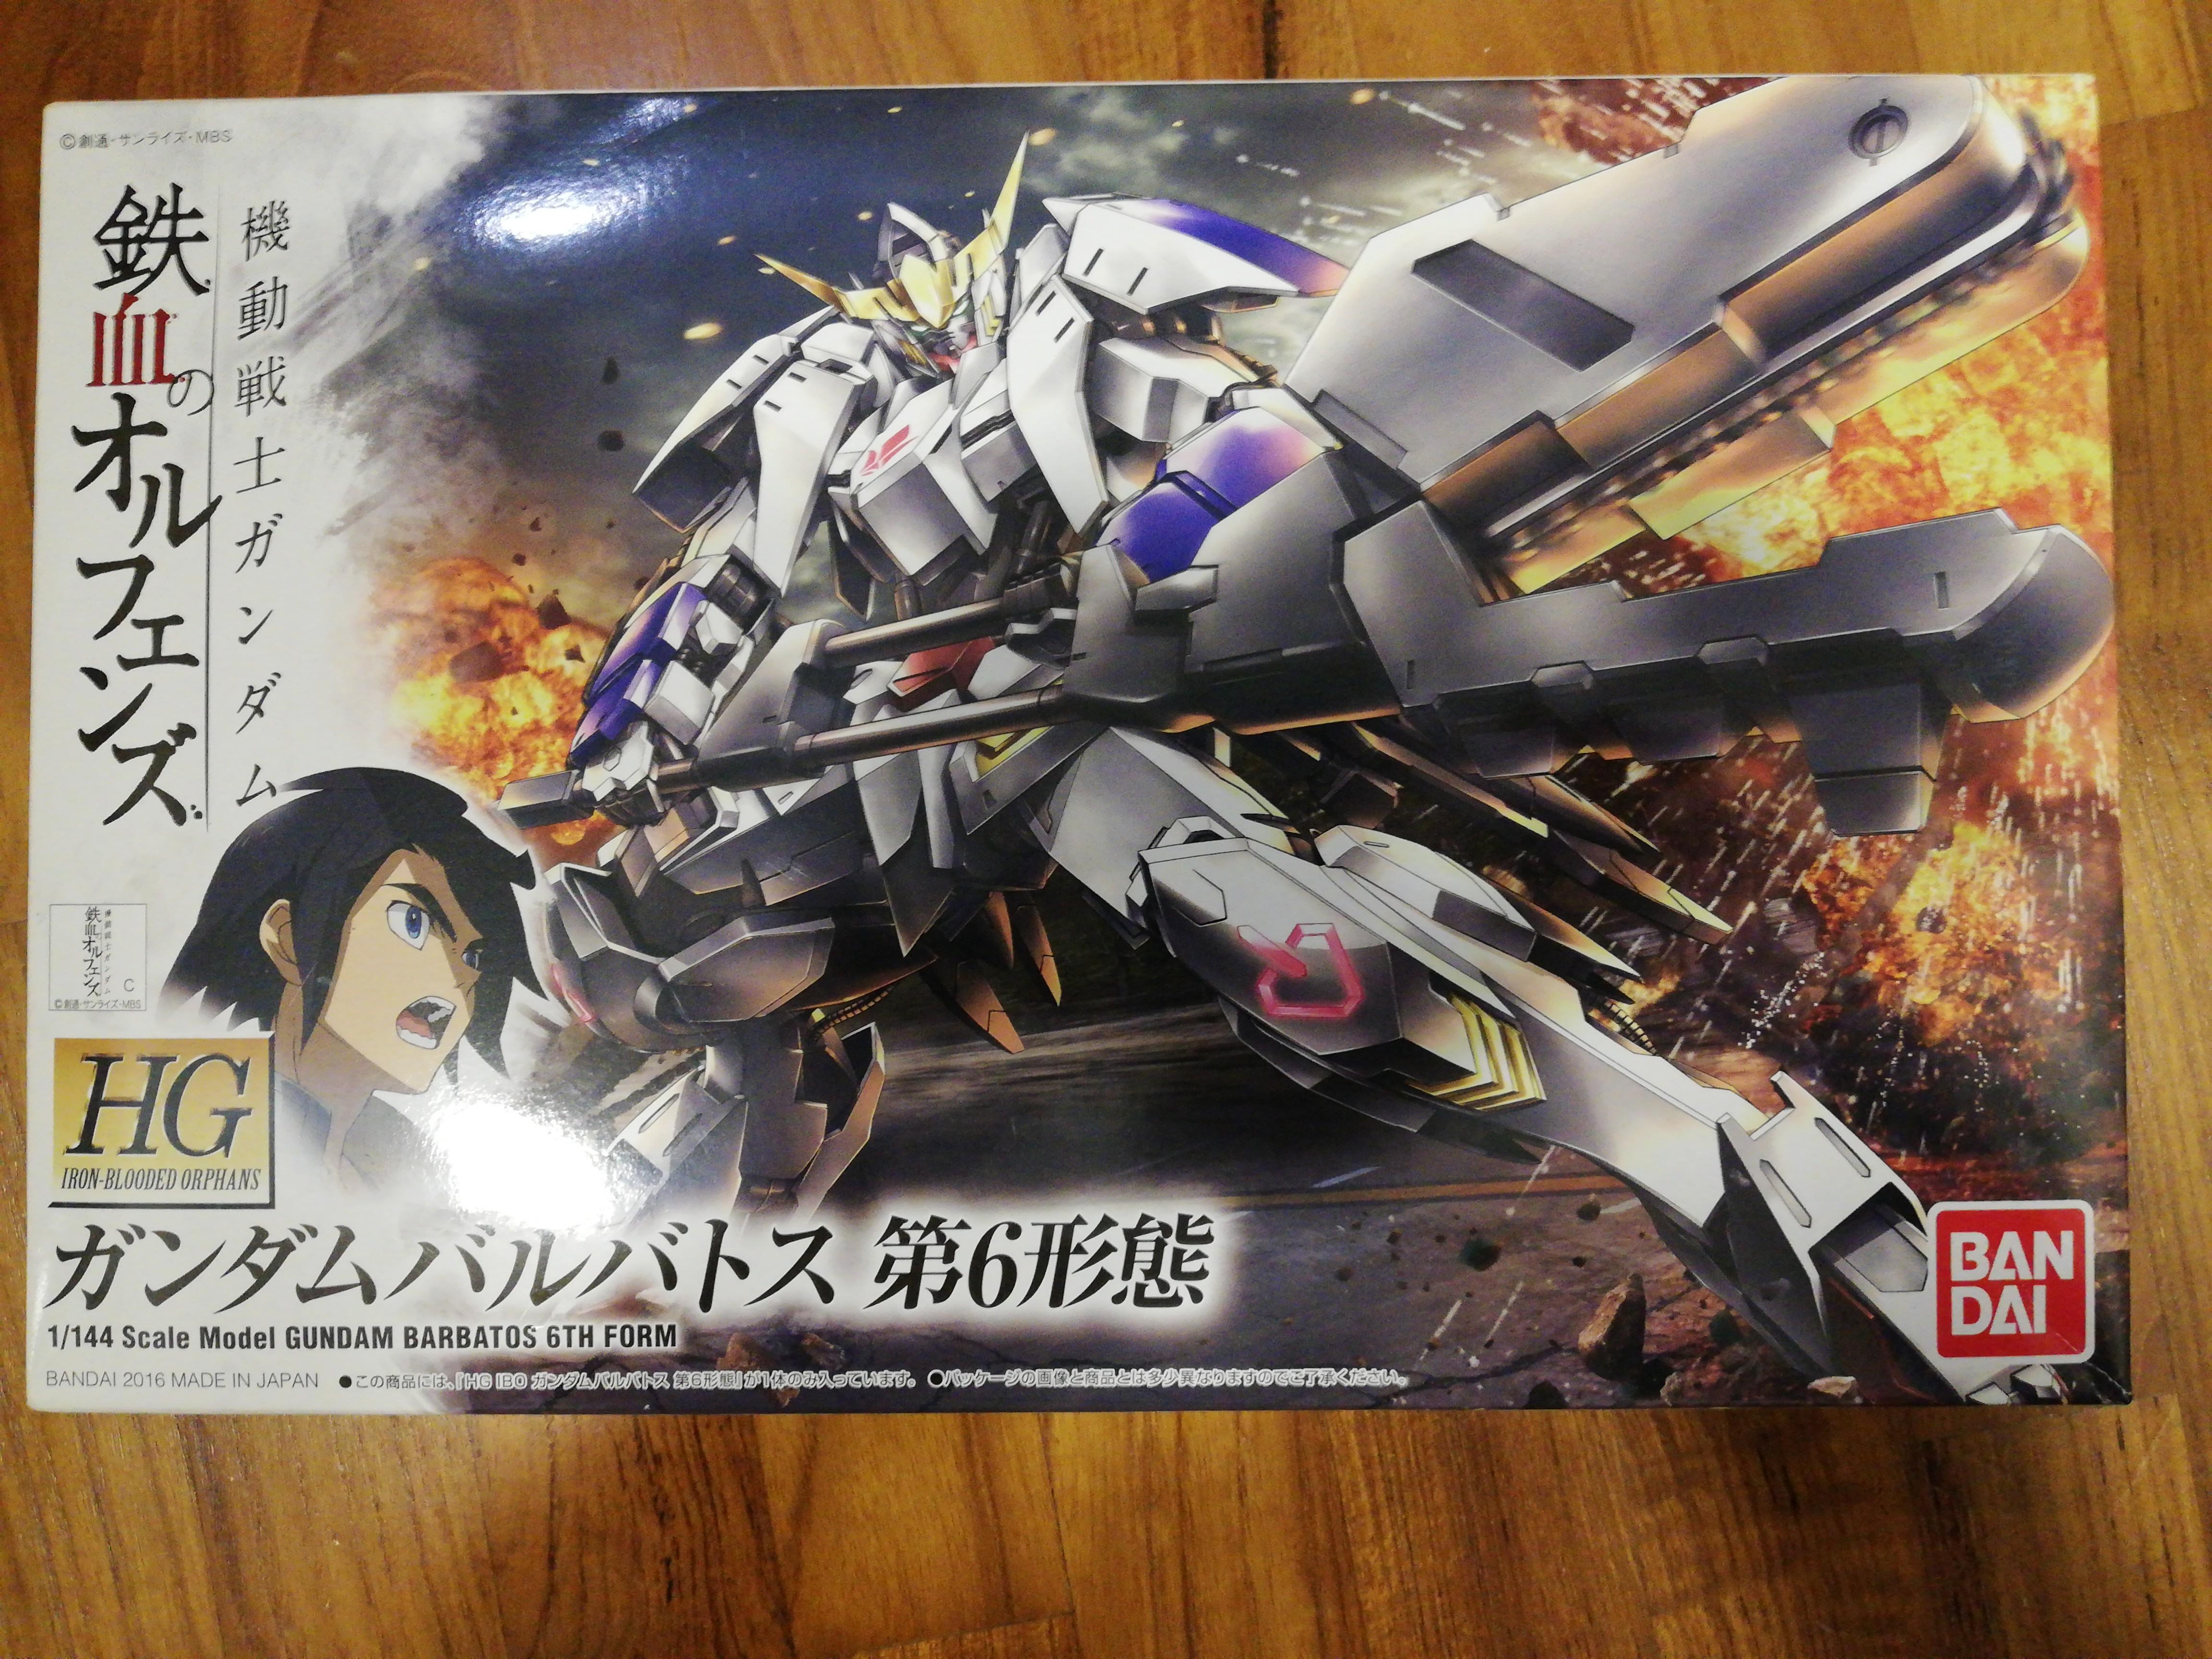 Hg Gundam Barbatos 6th Sixth Form 1 144 Toys Games Bricks Figurines On Carousell